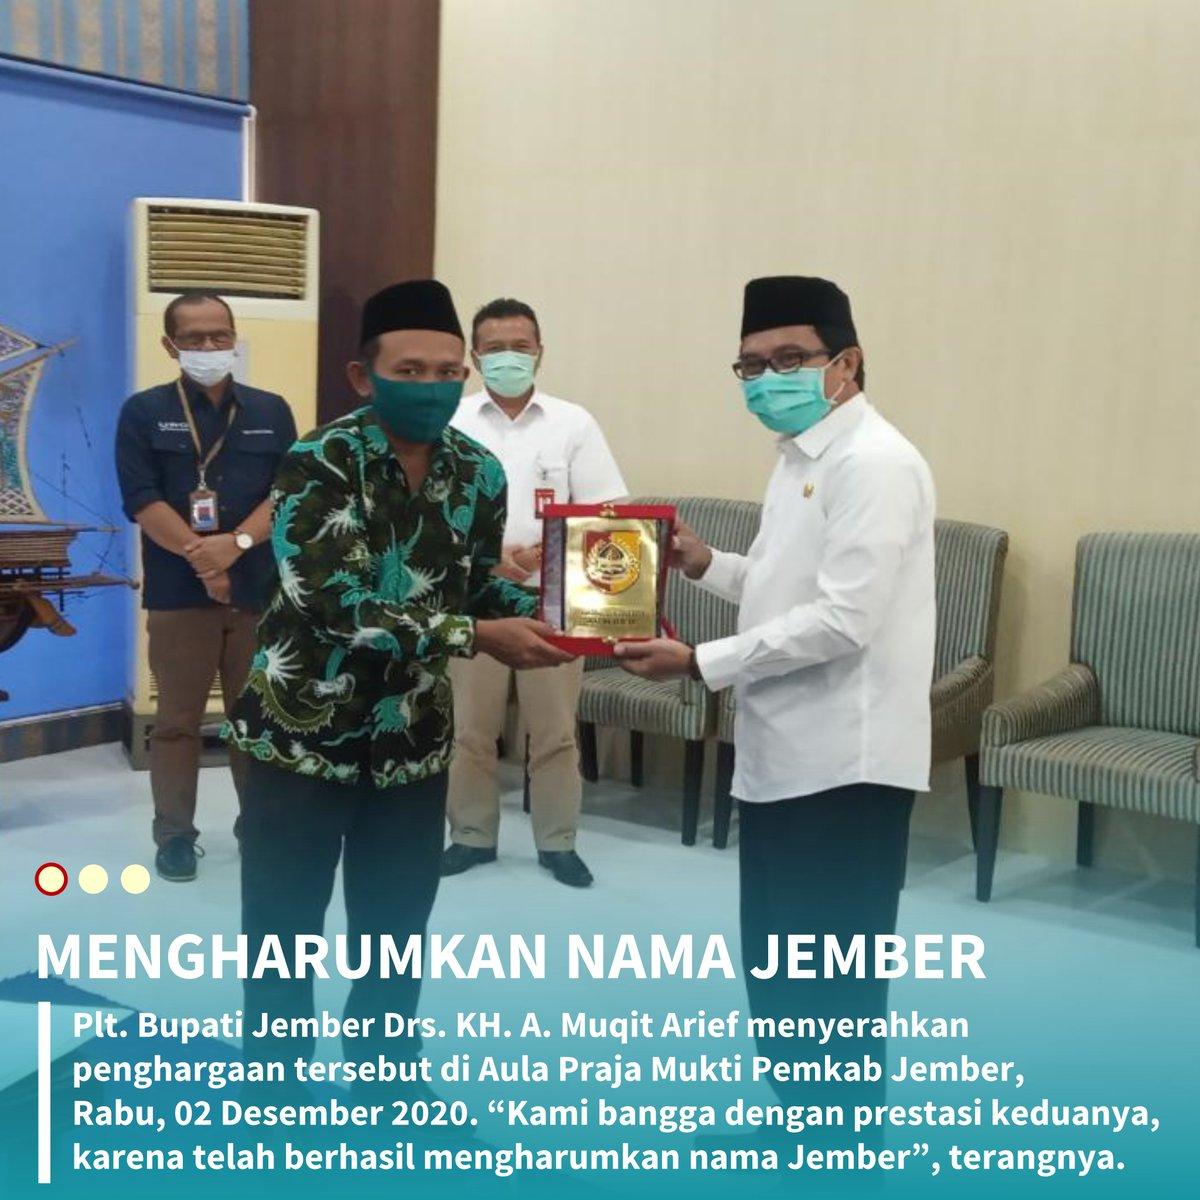 Pelaksana tugas (Plt) Bupati Jember Drs. KH. A. Muqit Arief menyerahkan penghargaan tersebut di Aula Praja Mukti Pemkab Jember, Rabu, 02 Desember 2020. https://t.co/j6lPGNy7gz